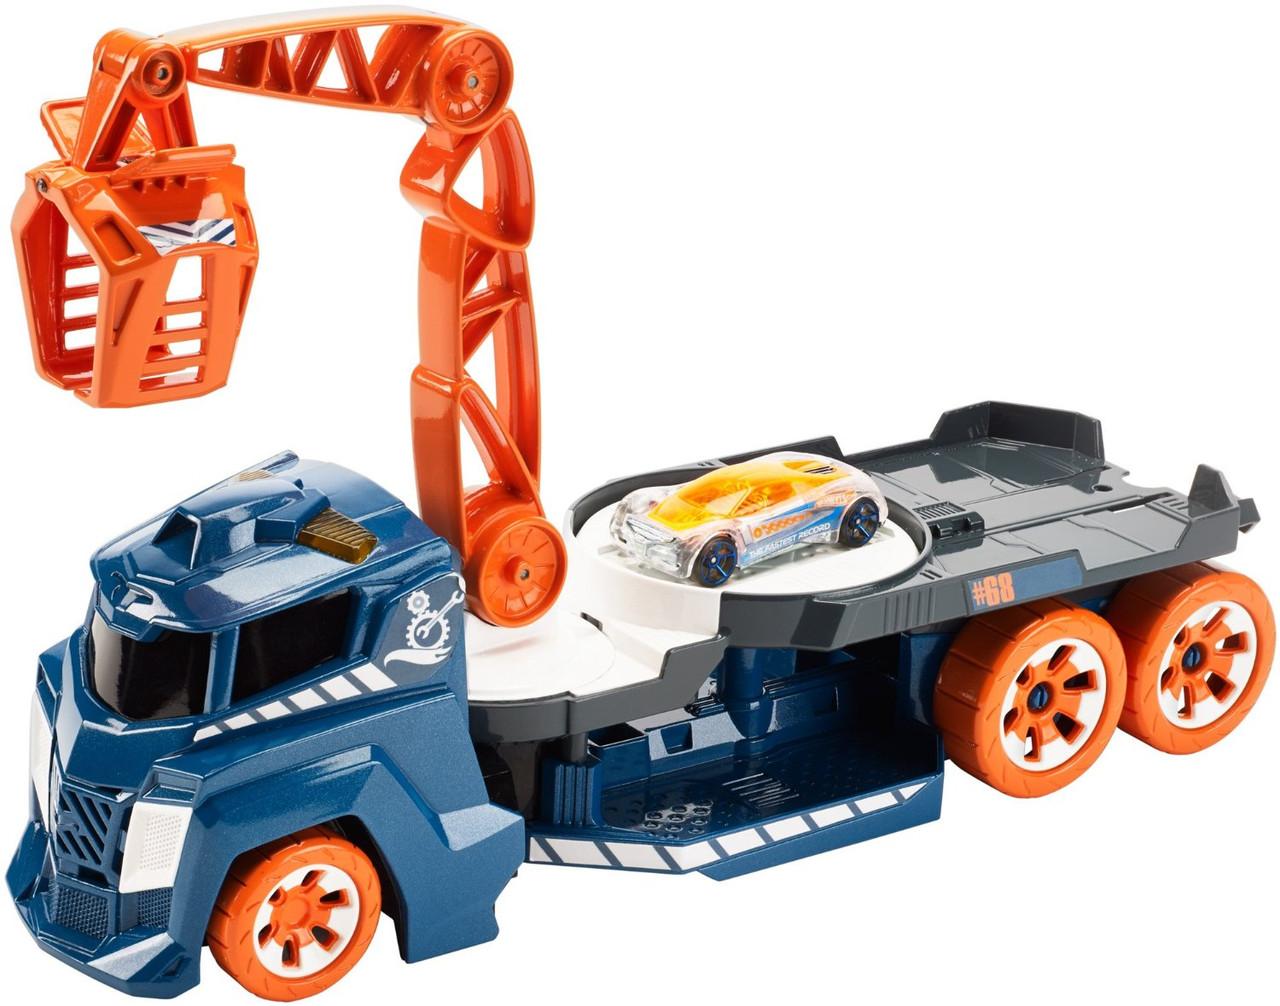 Хот Вилс Грузовик с краном со звуком и светом Hot Wheels Spinnin' Sound Crane, Lights and Sounds Vehicle